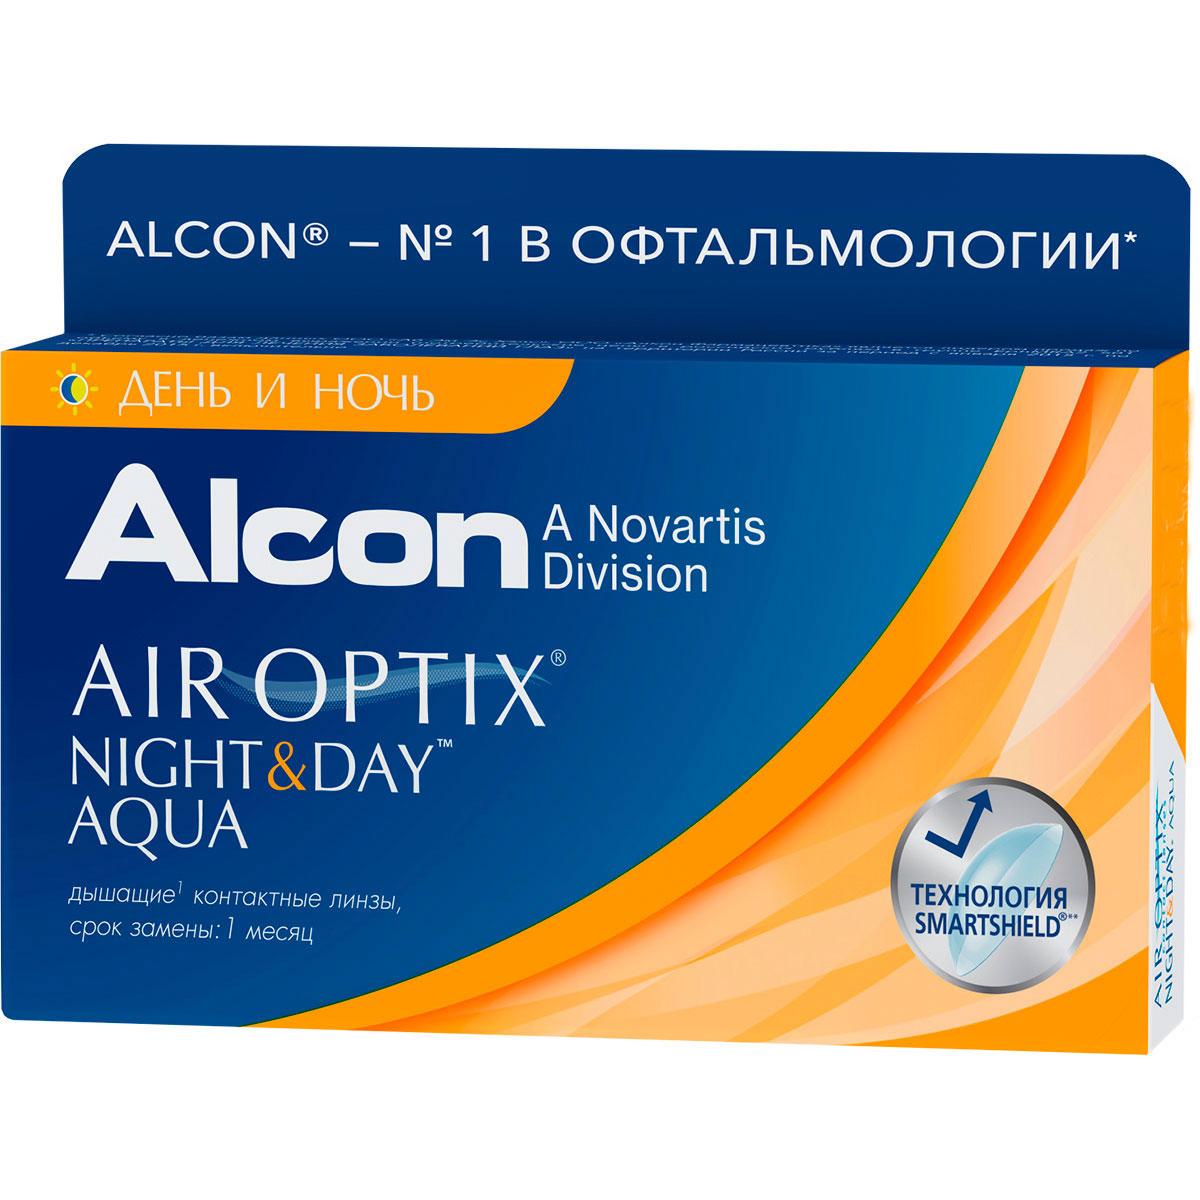 Alcon-CIBA Vision контактные линзы Air Optix Night & Day Aqua (3шт / 8.4 / -2.00)